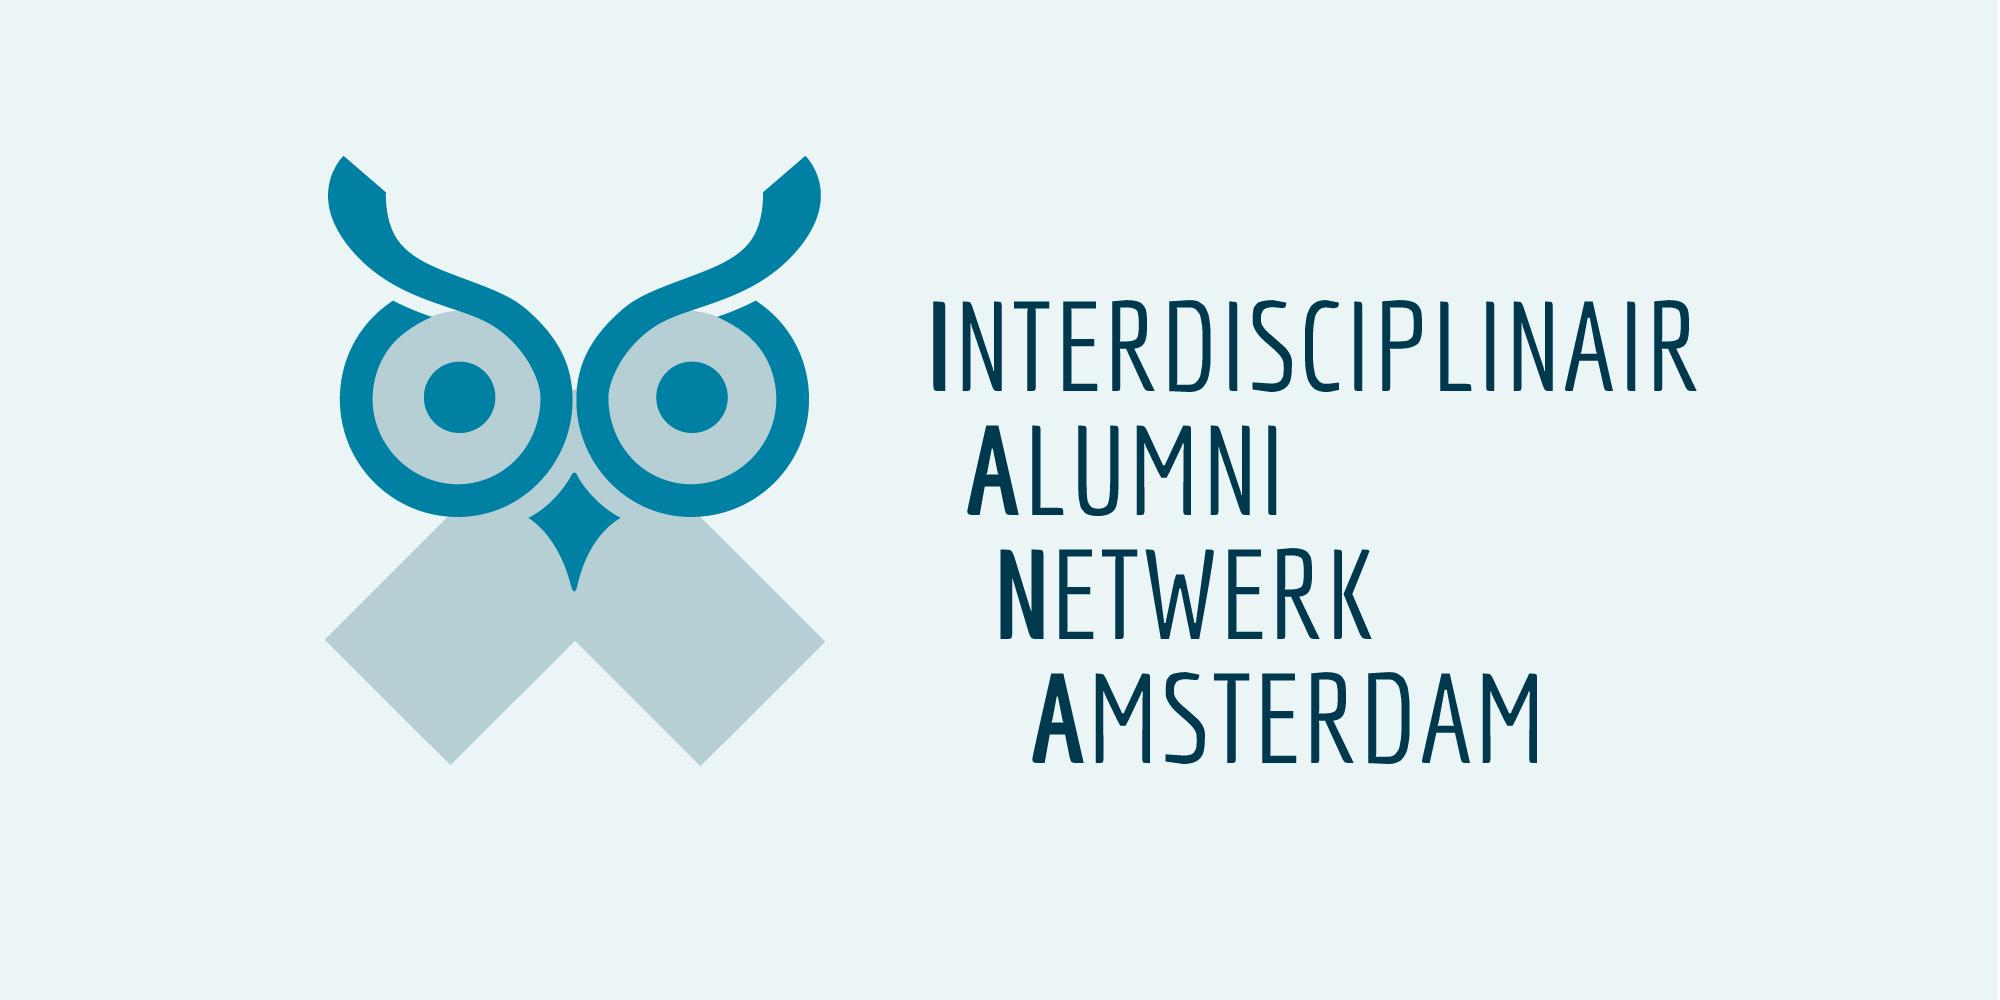 Interdisciplinair Alumni Netwerk Amsterdam